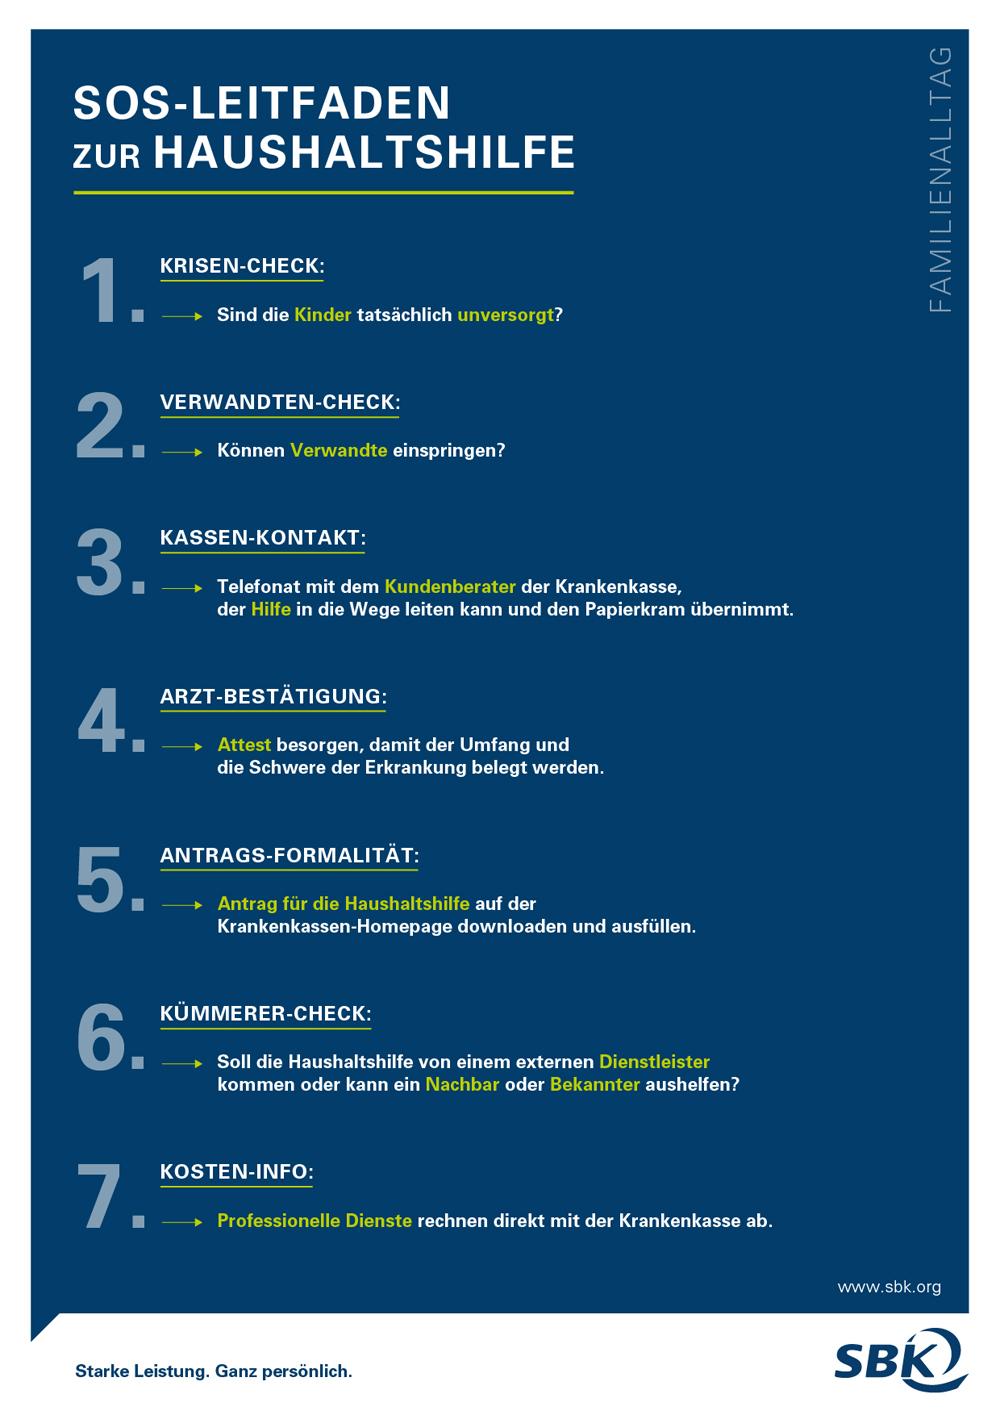 SBK_Infografik_Haushaltshilfe